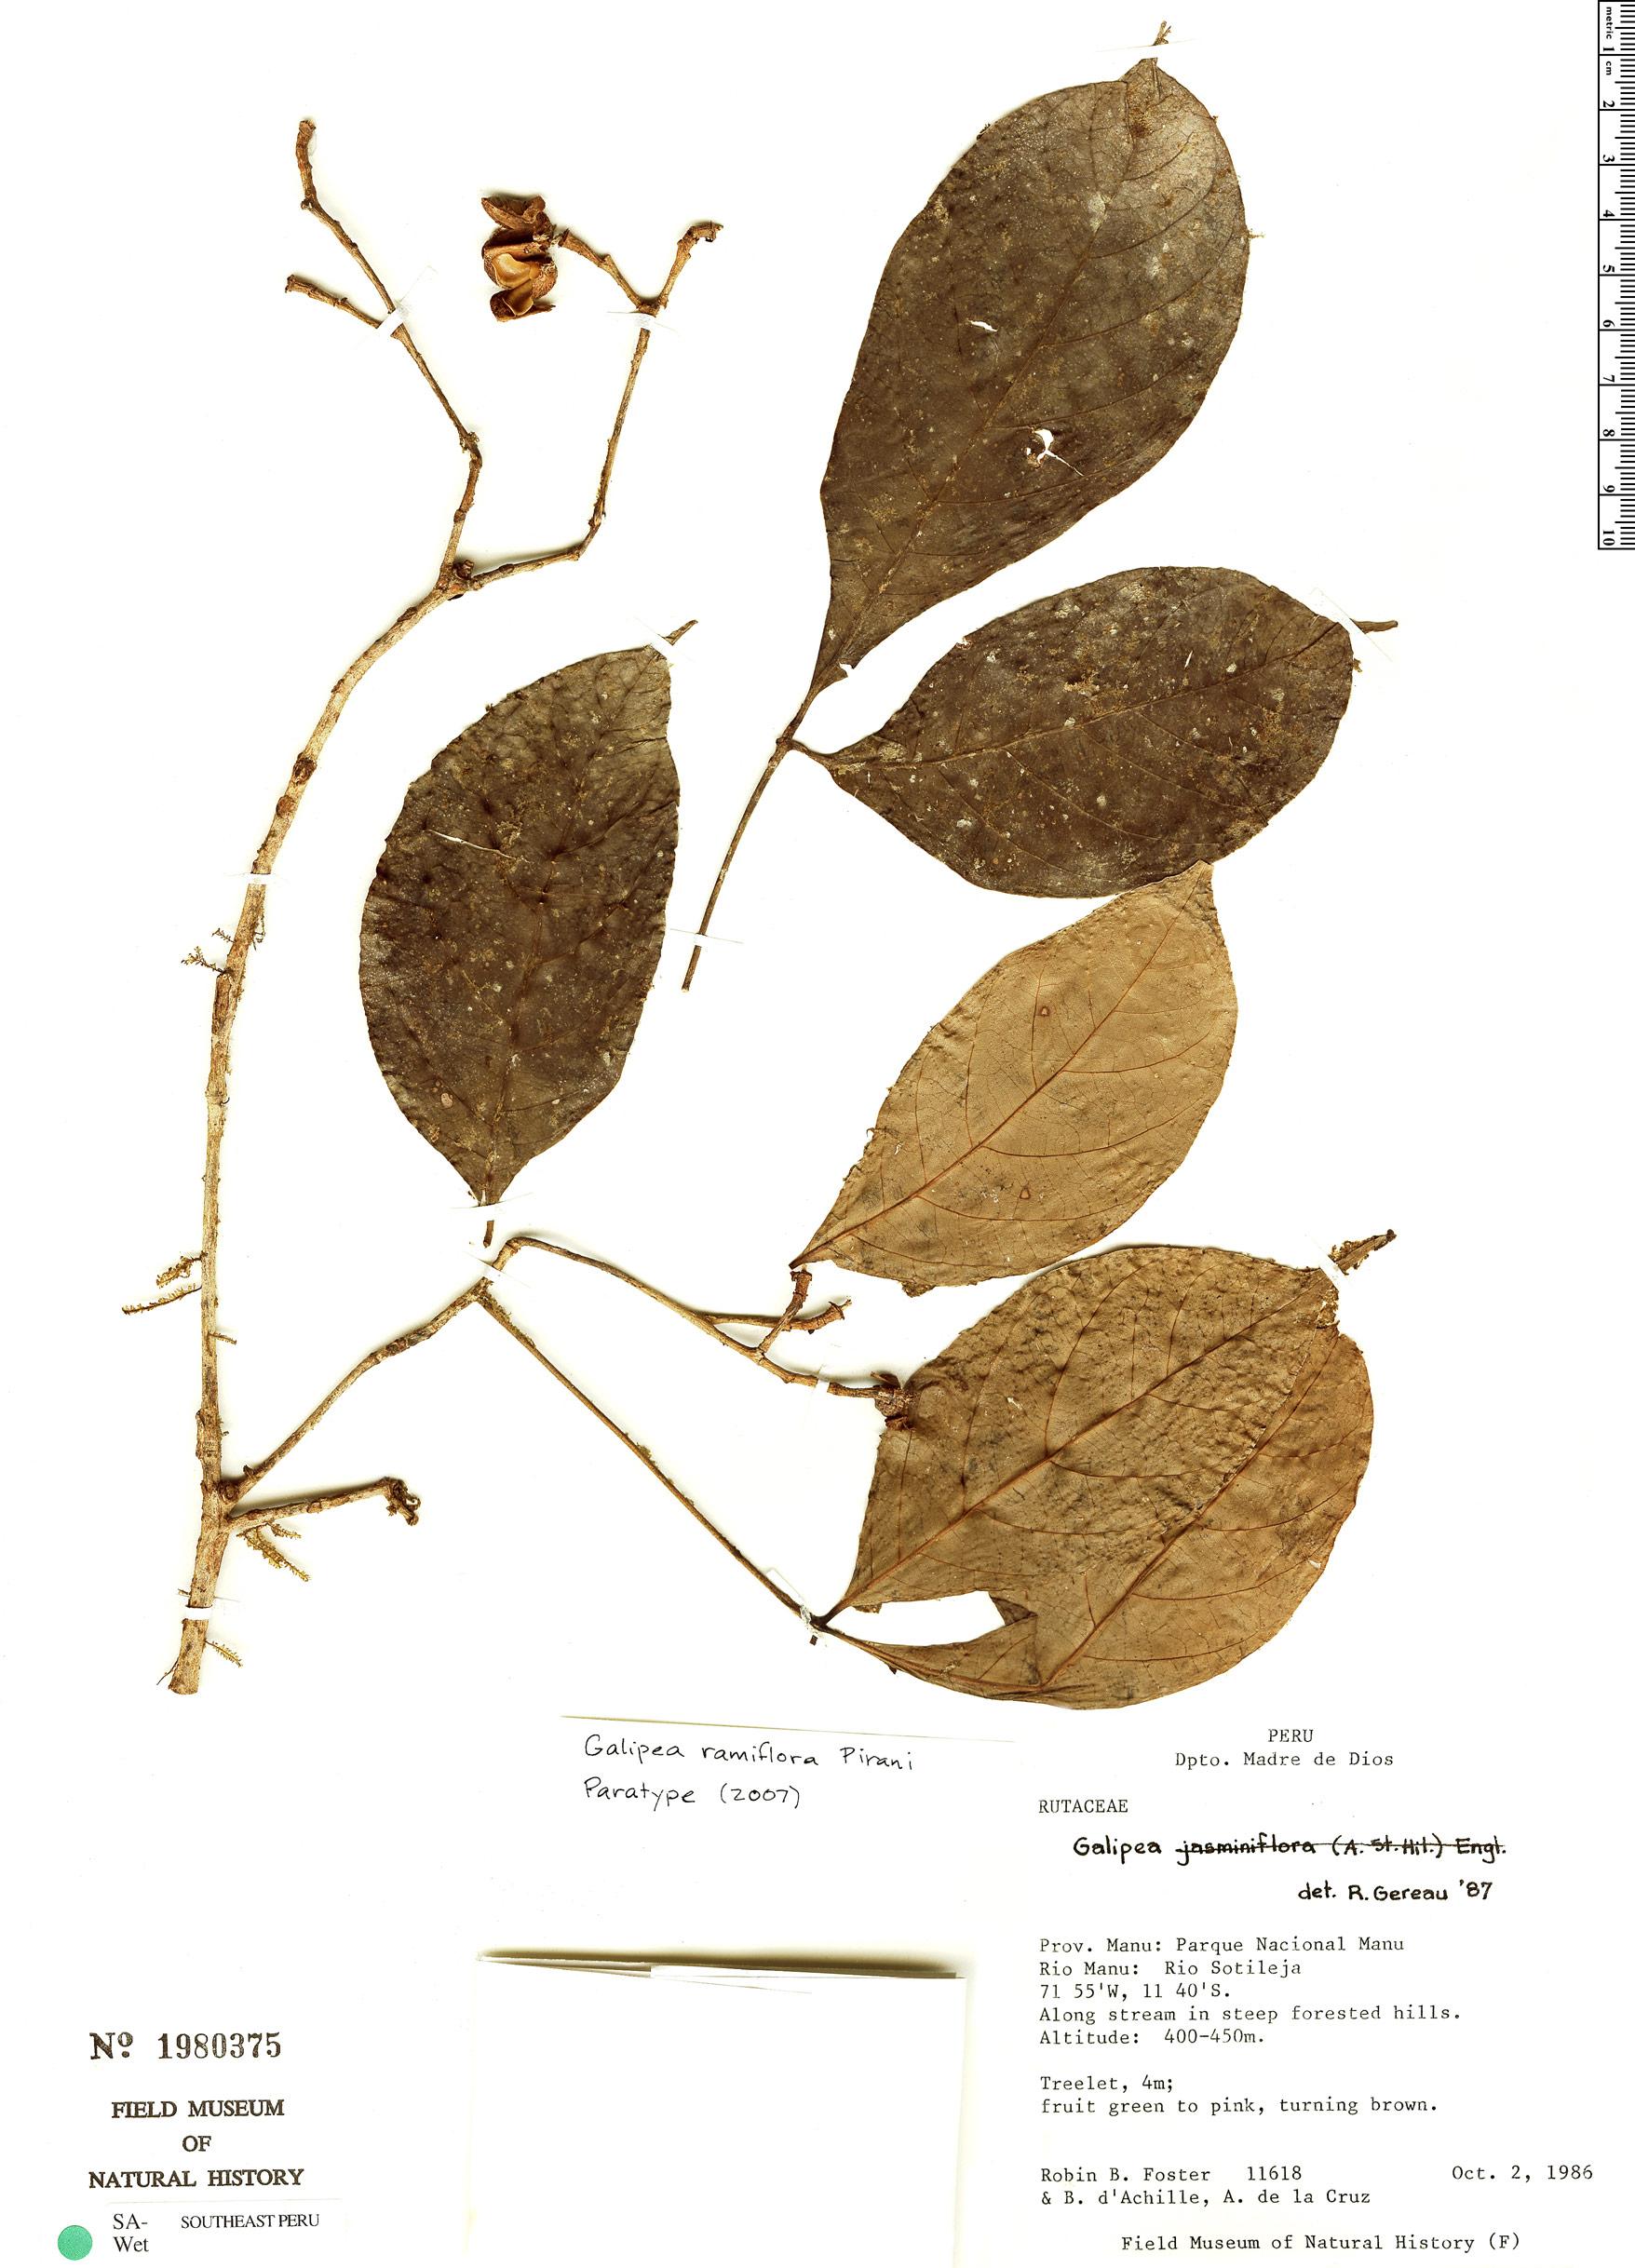 Espécime: Galipea ramiflora